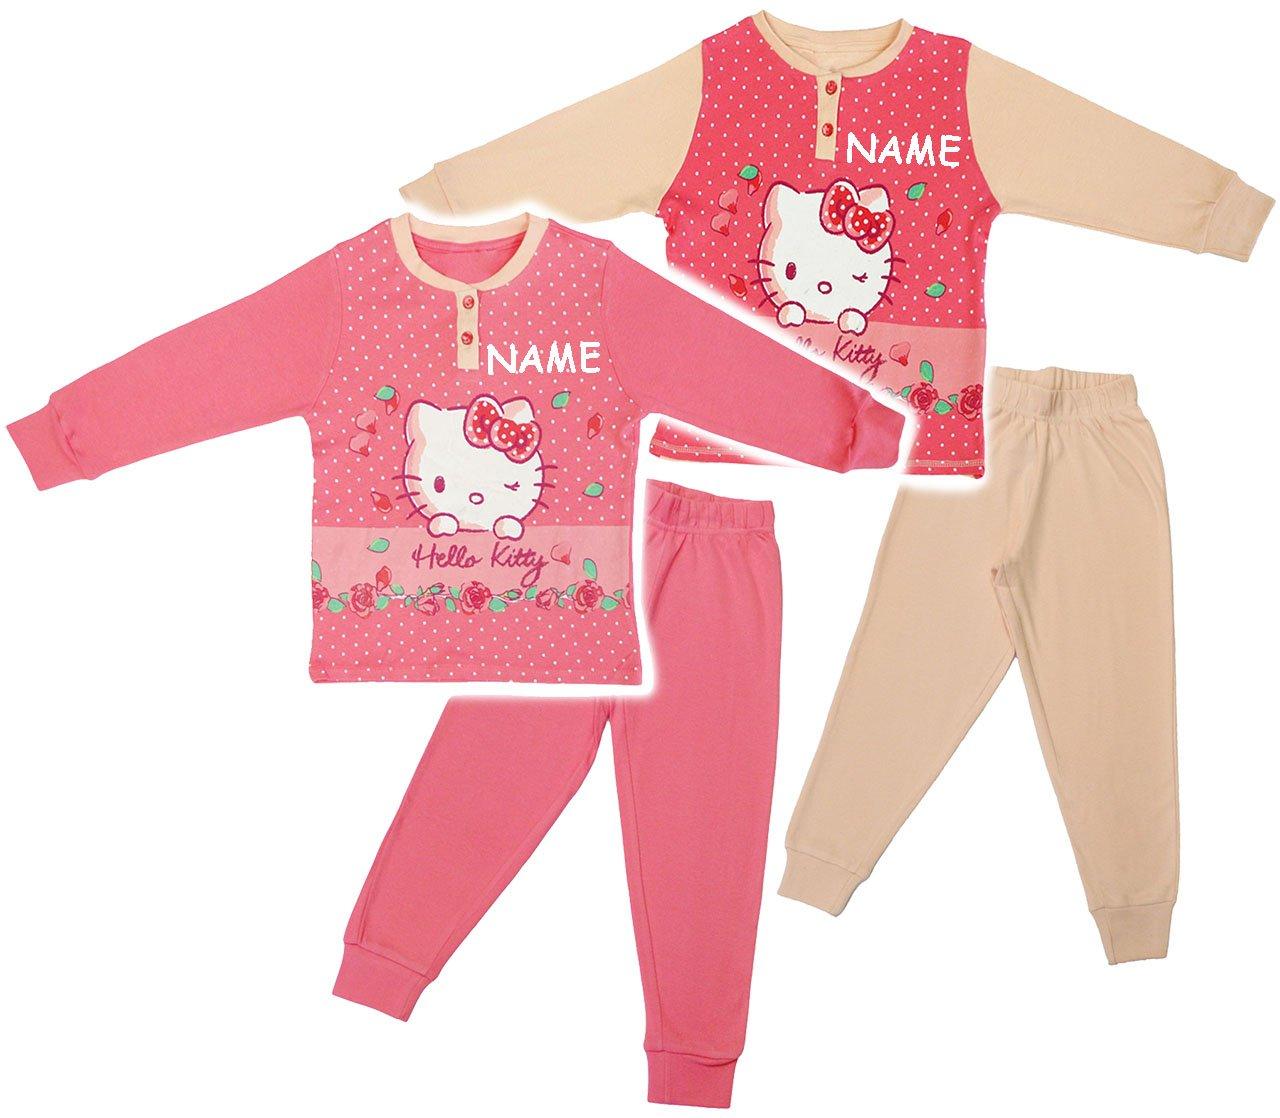 alles-meine.de GmbH 2 tlg. Set _ Hausanzug / Schlafanzug - Katze - Hello Kitty - Incl. Name - ..